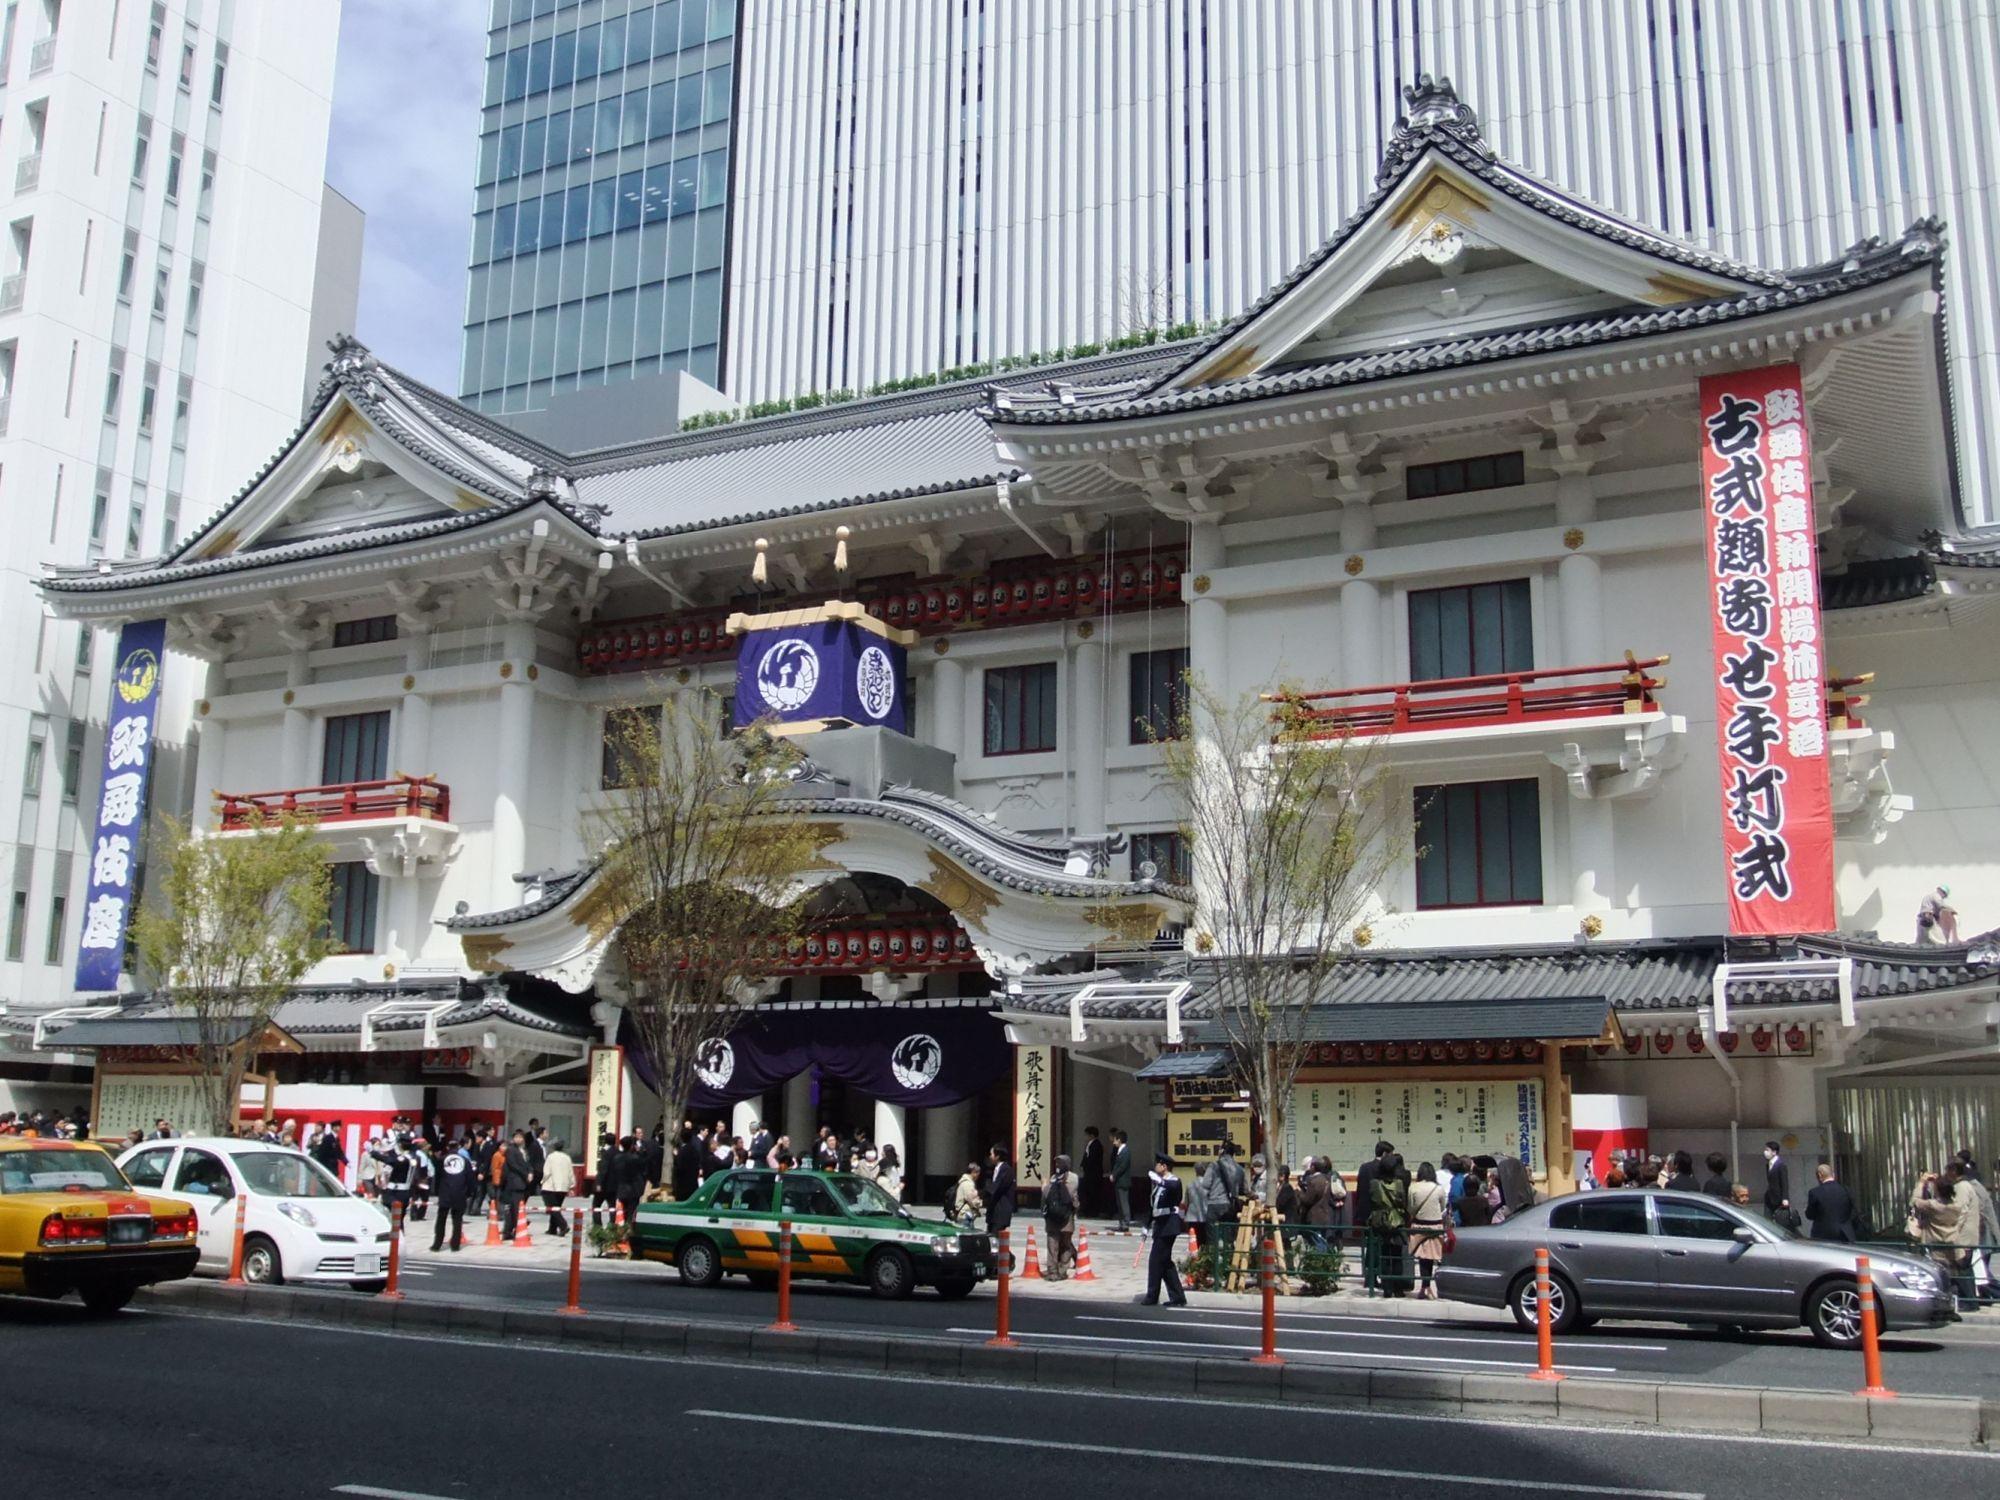 File:Kabuki-za Theatre 2013 0328.jpg - Wikimedia Commons